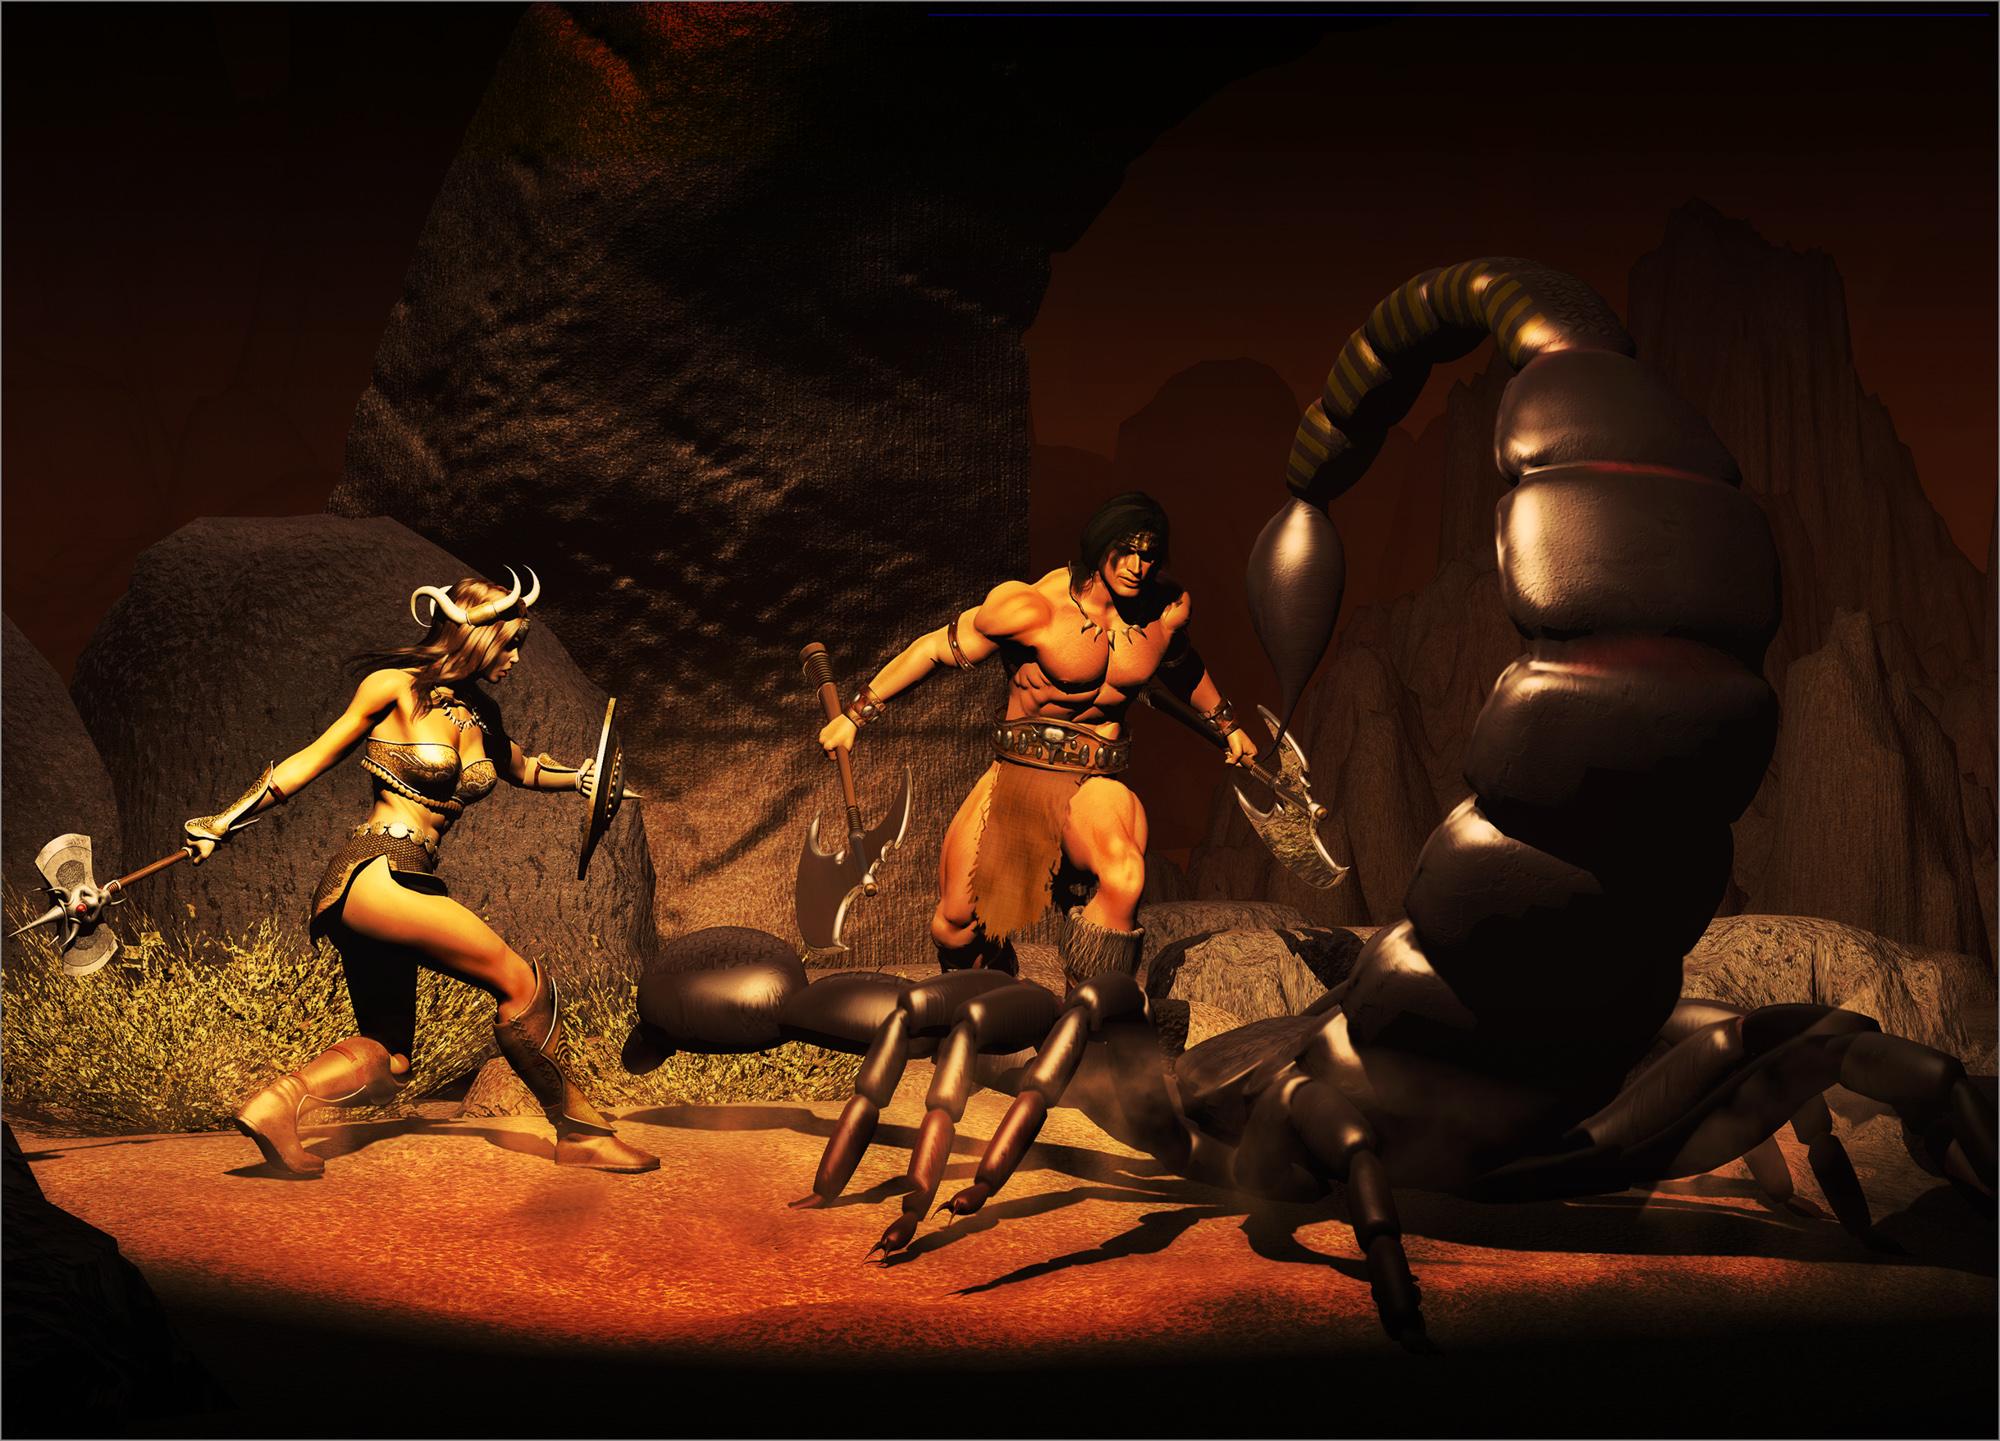 Scorpion King-artwork.jpg